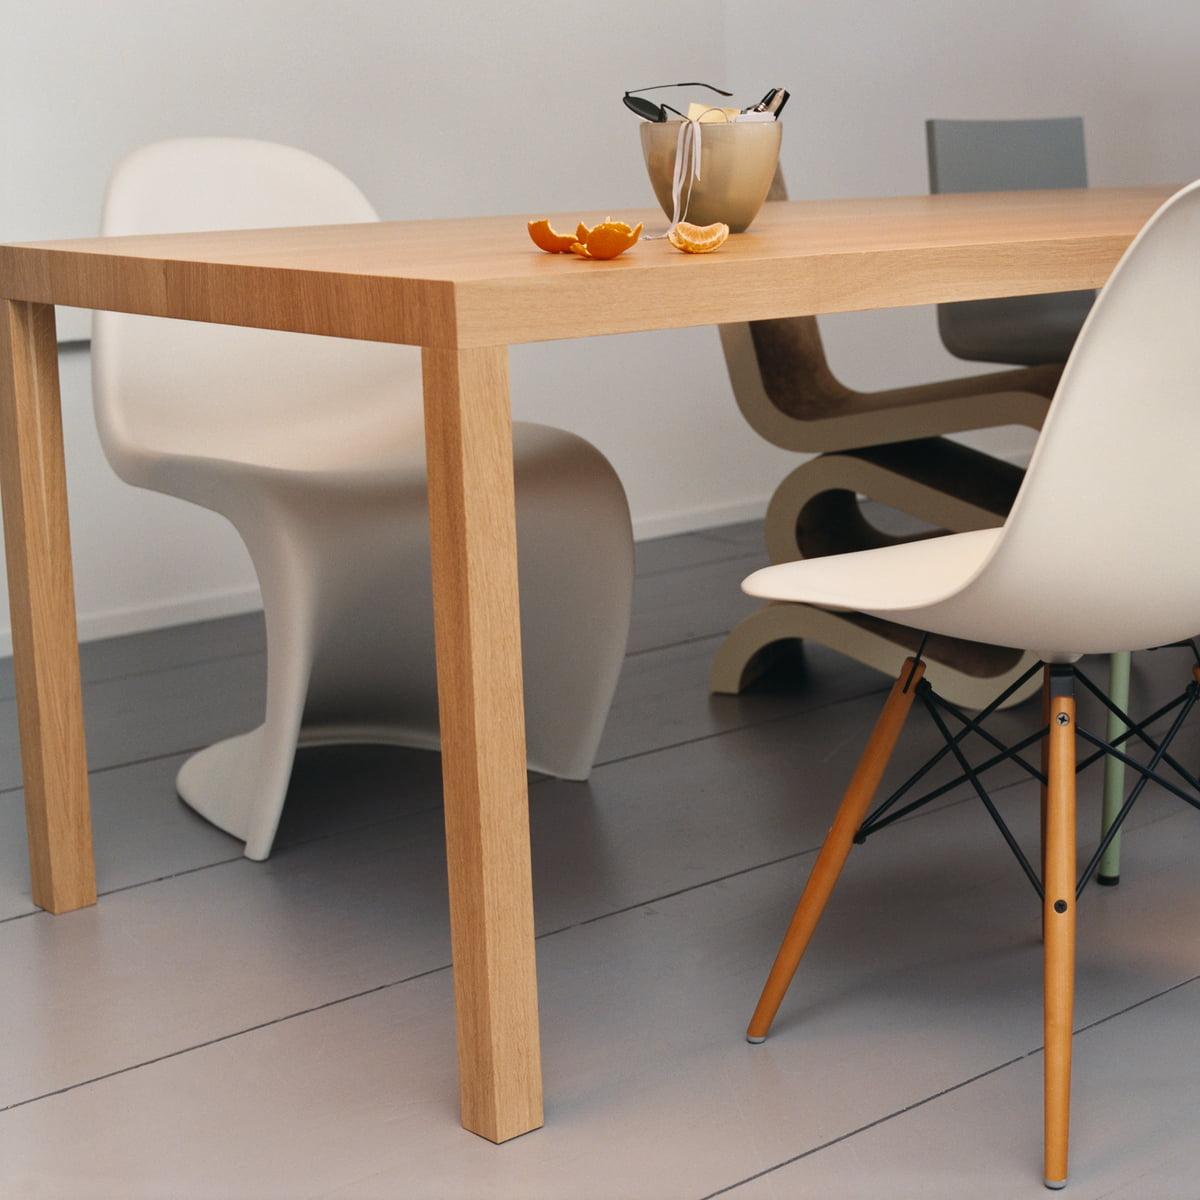 2da67110a7aa Panton Chair by Vitra in the shop